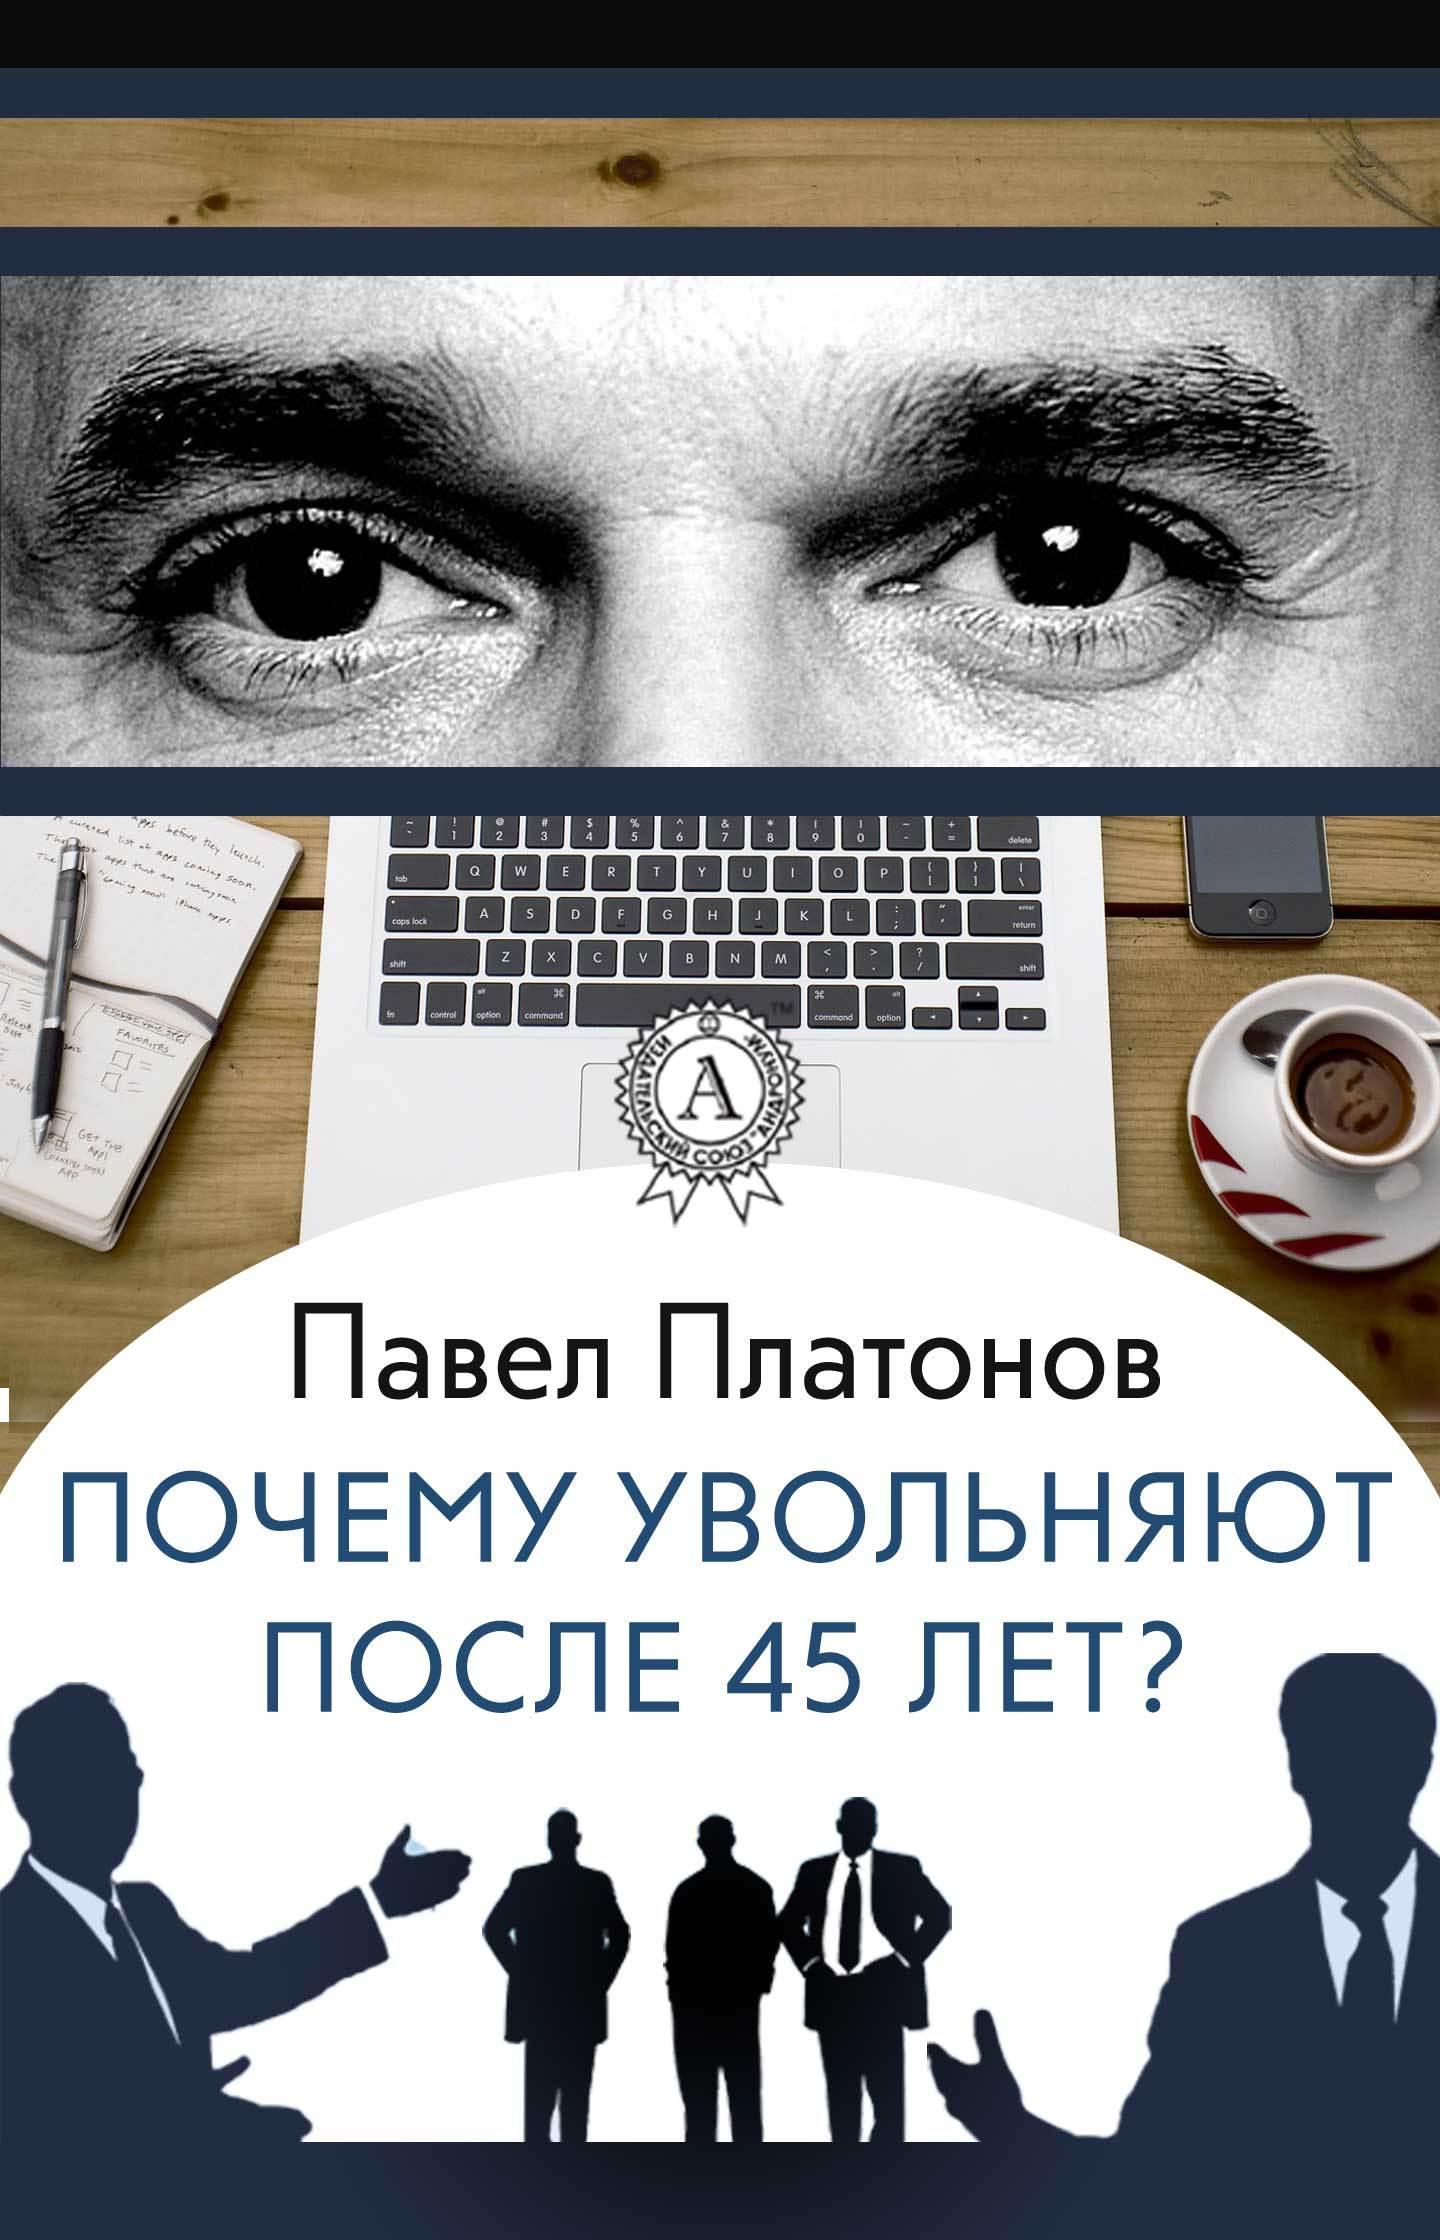 обложка книги static/bookimages/21/50/85/21508517.bin.dir/21508517.cover.jpg